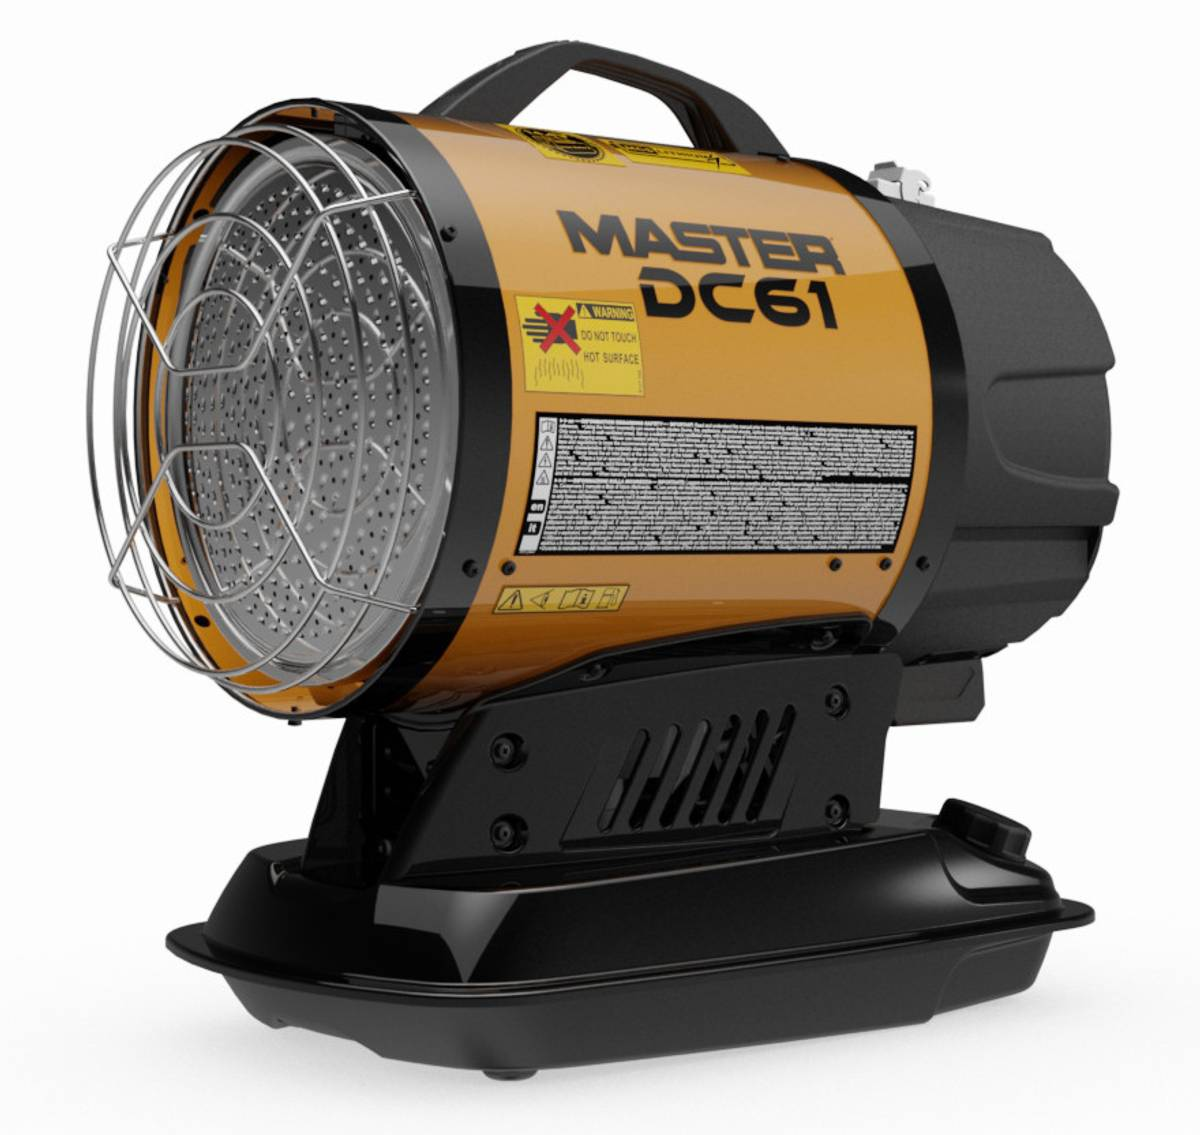 Master Varmluftsaggregat DC61 - Infrarød stråleovn